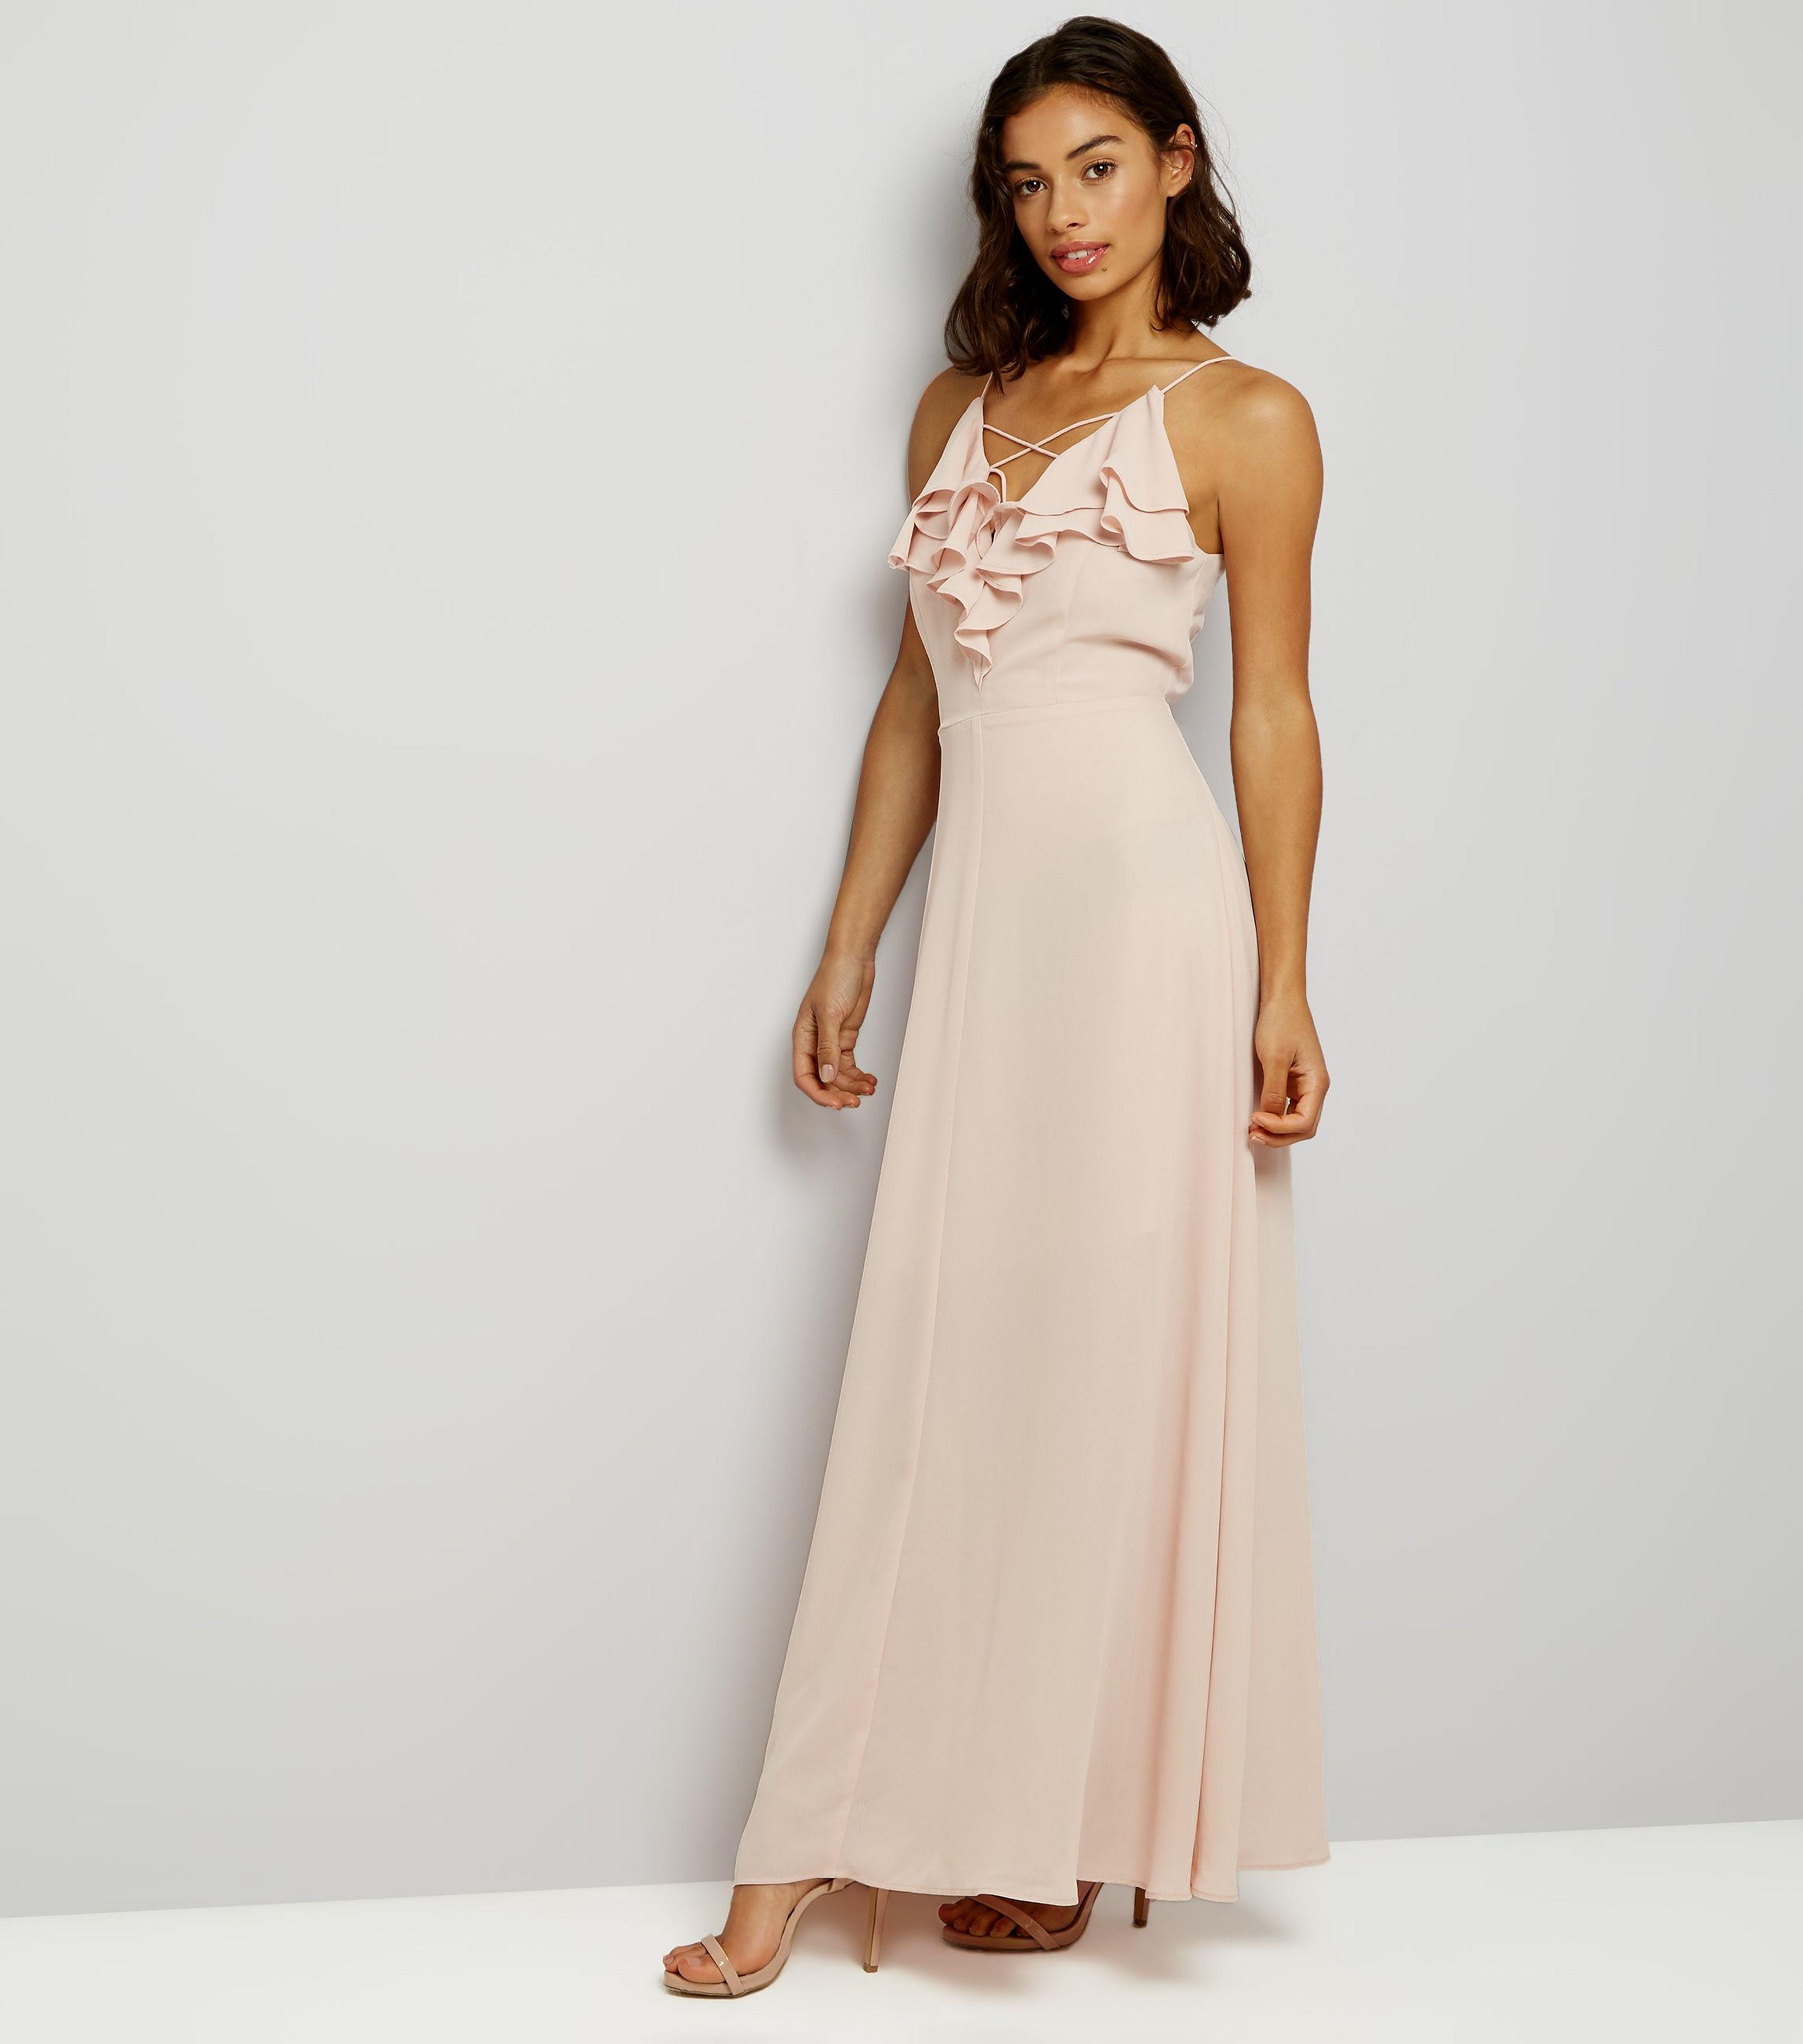 48b60235fe65 New Look Petite Summer Dresses - raveitsafe